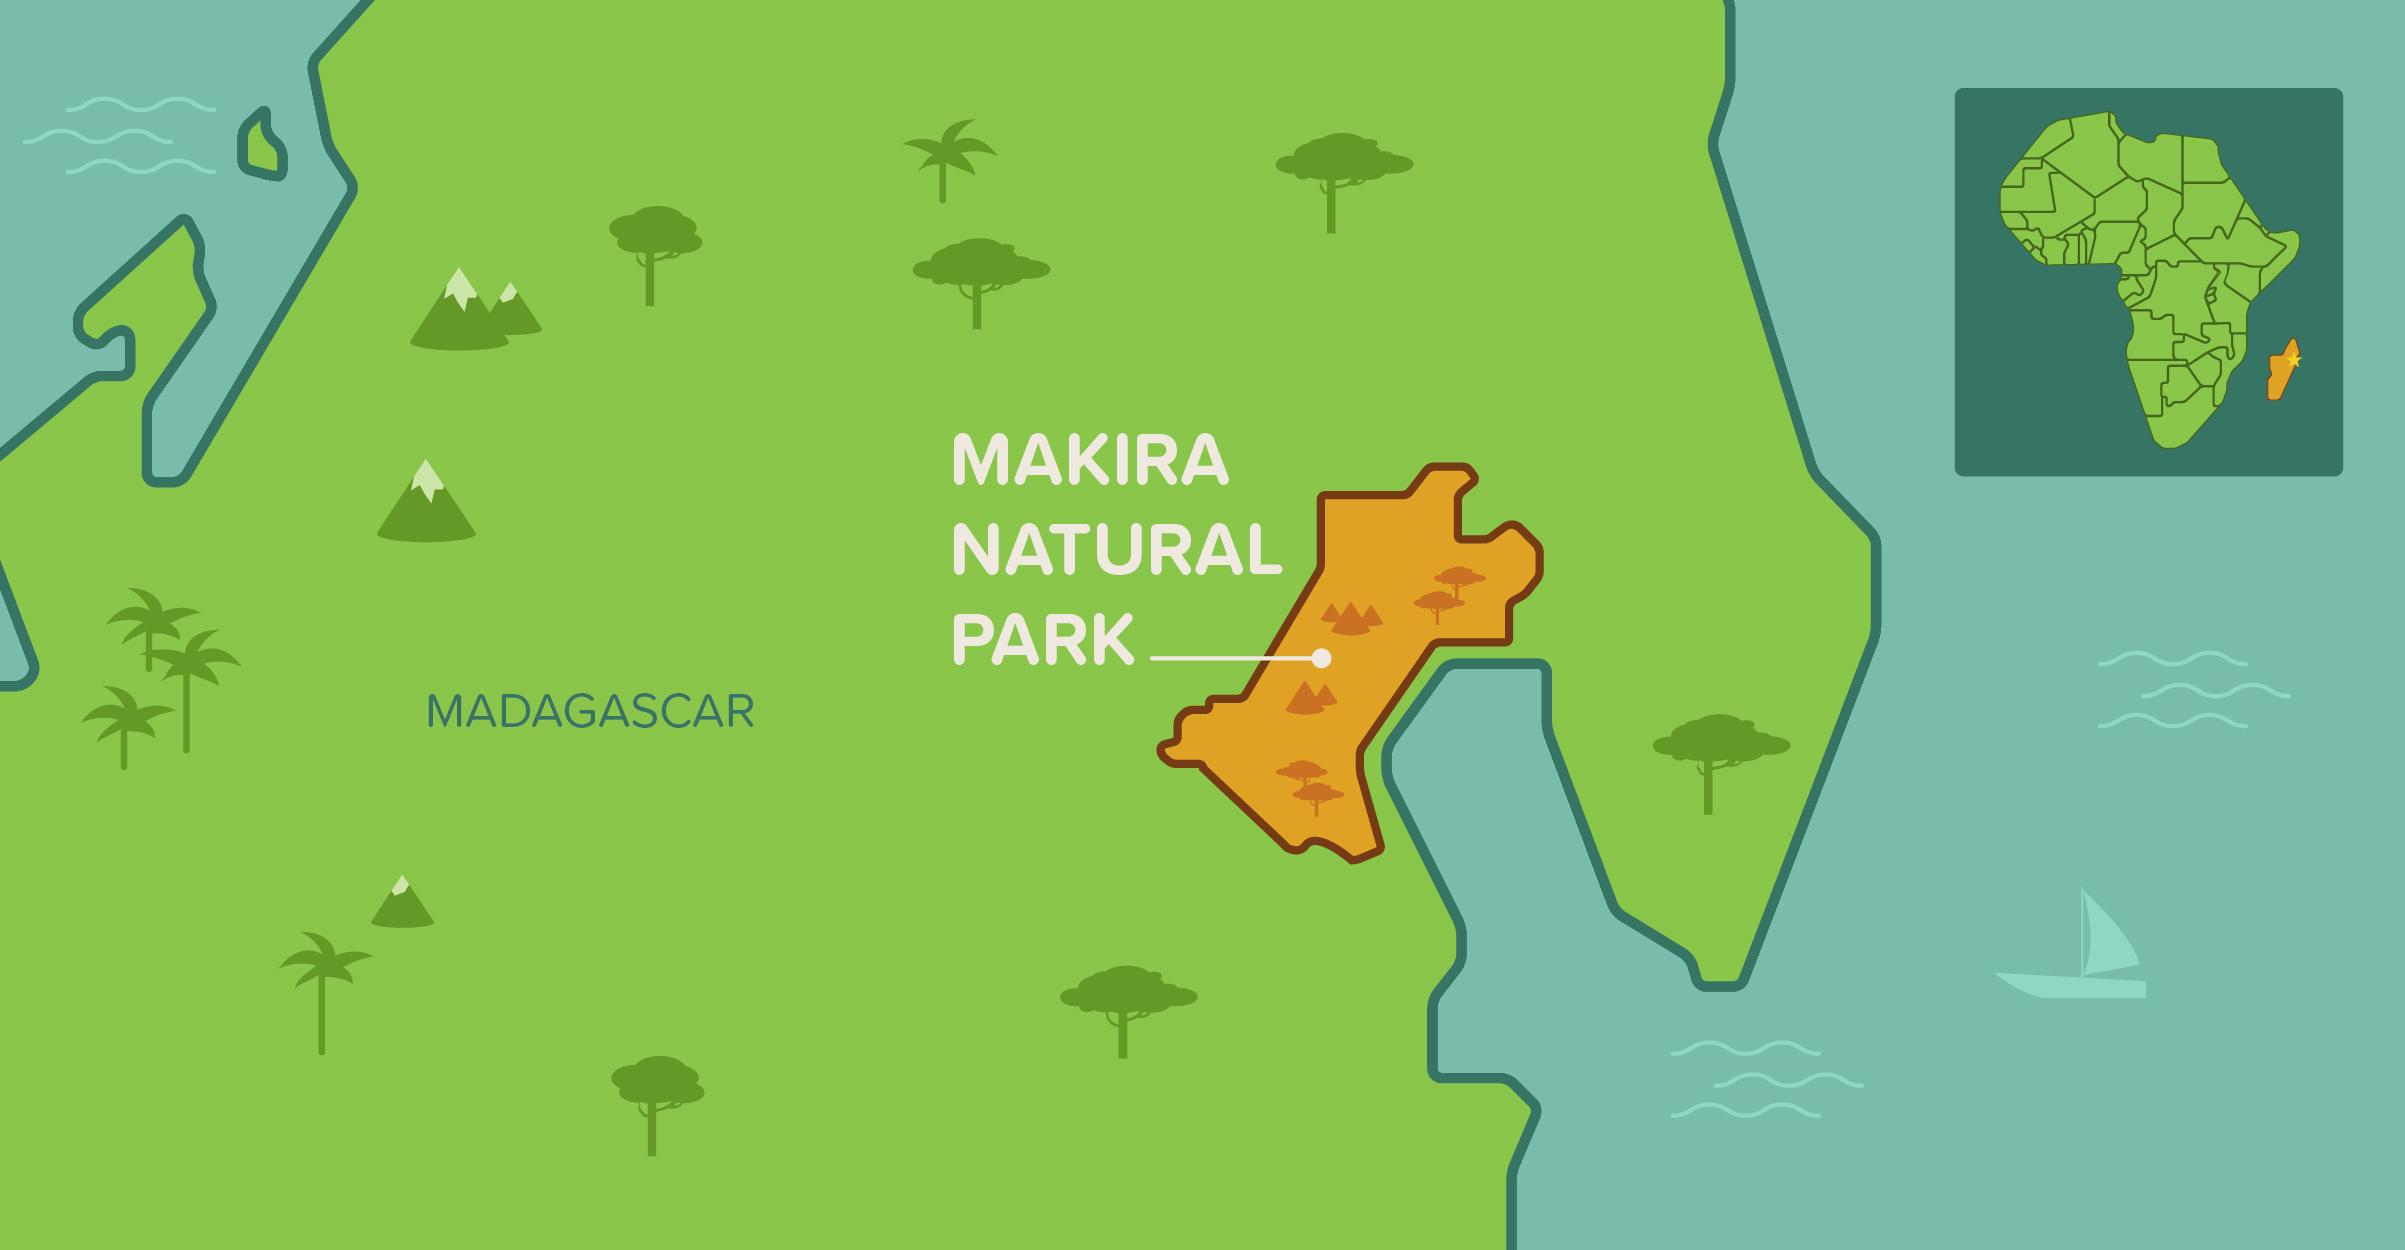 makira_map-01 copy.jpg